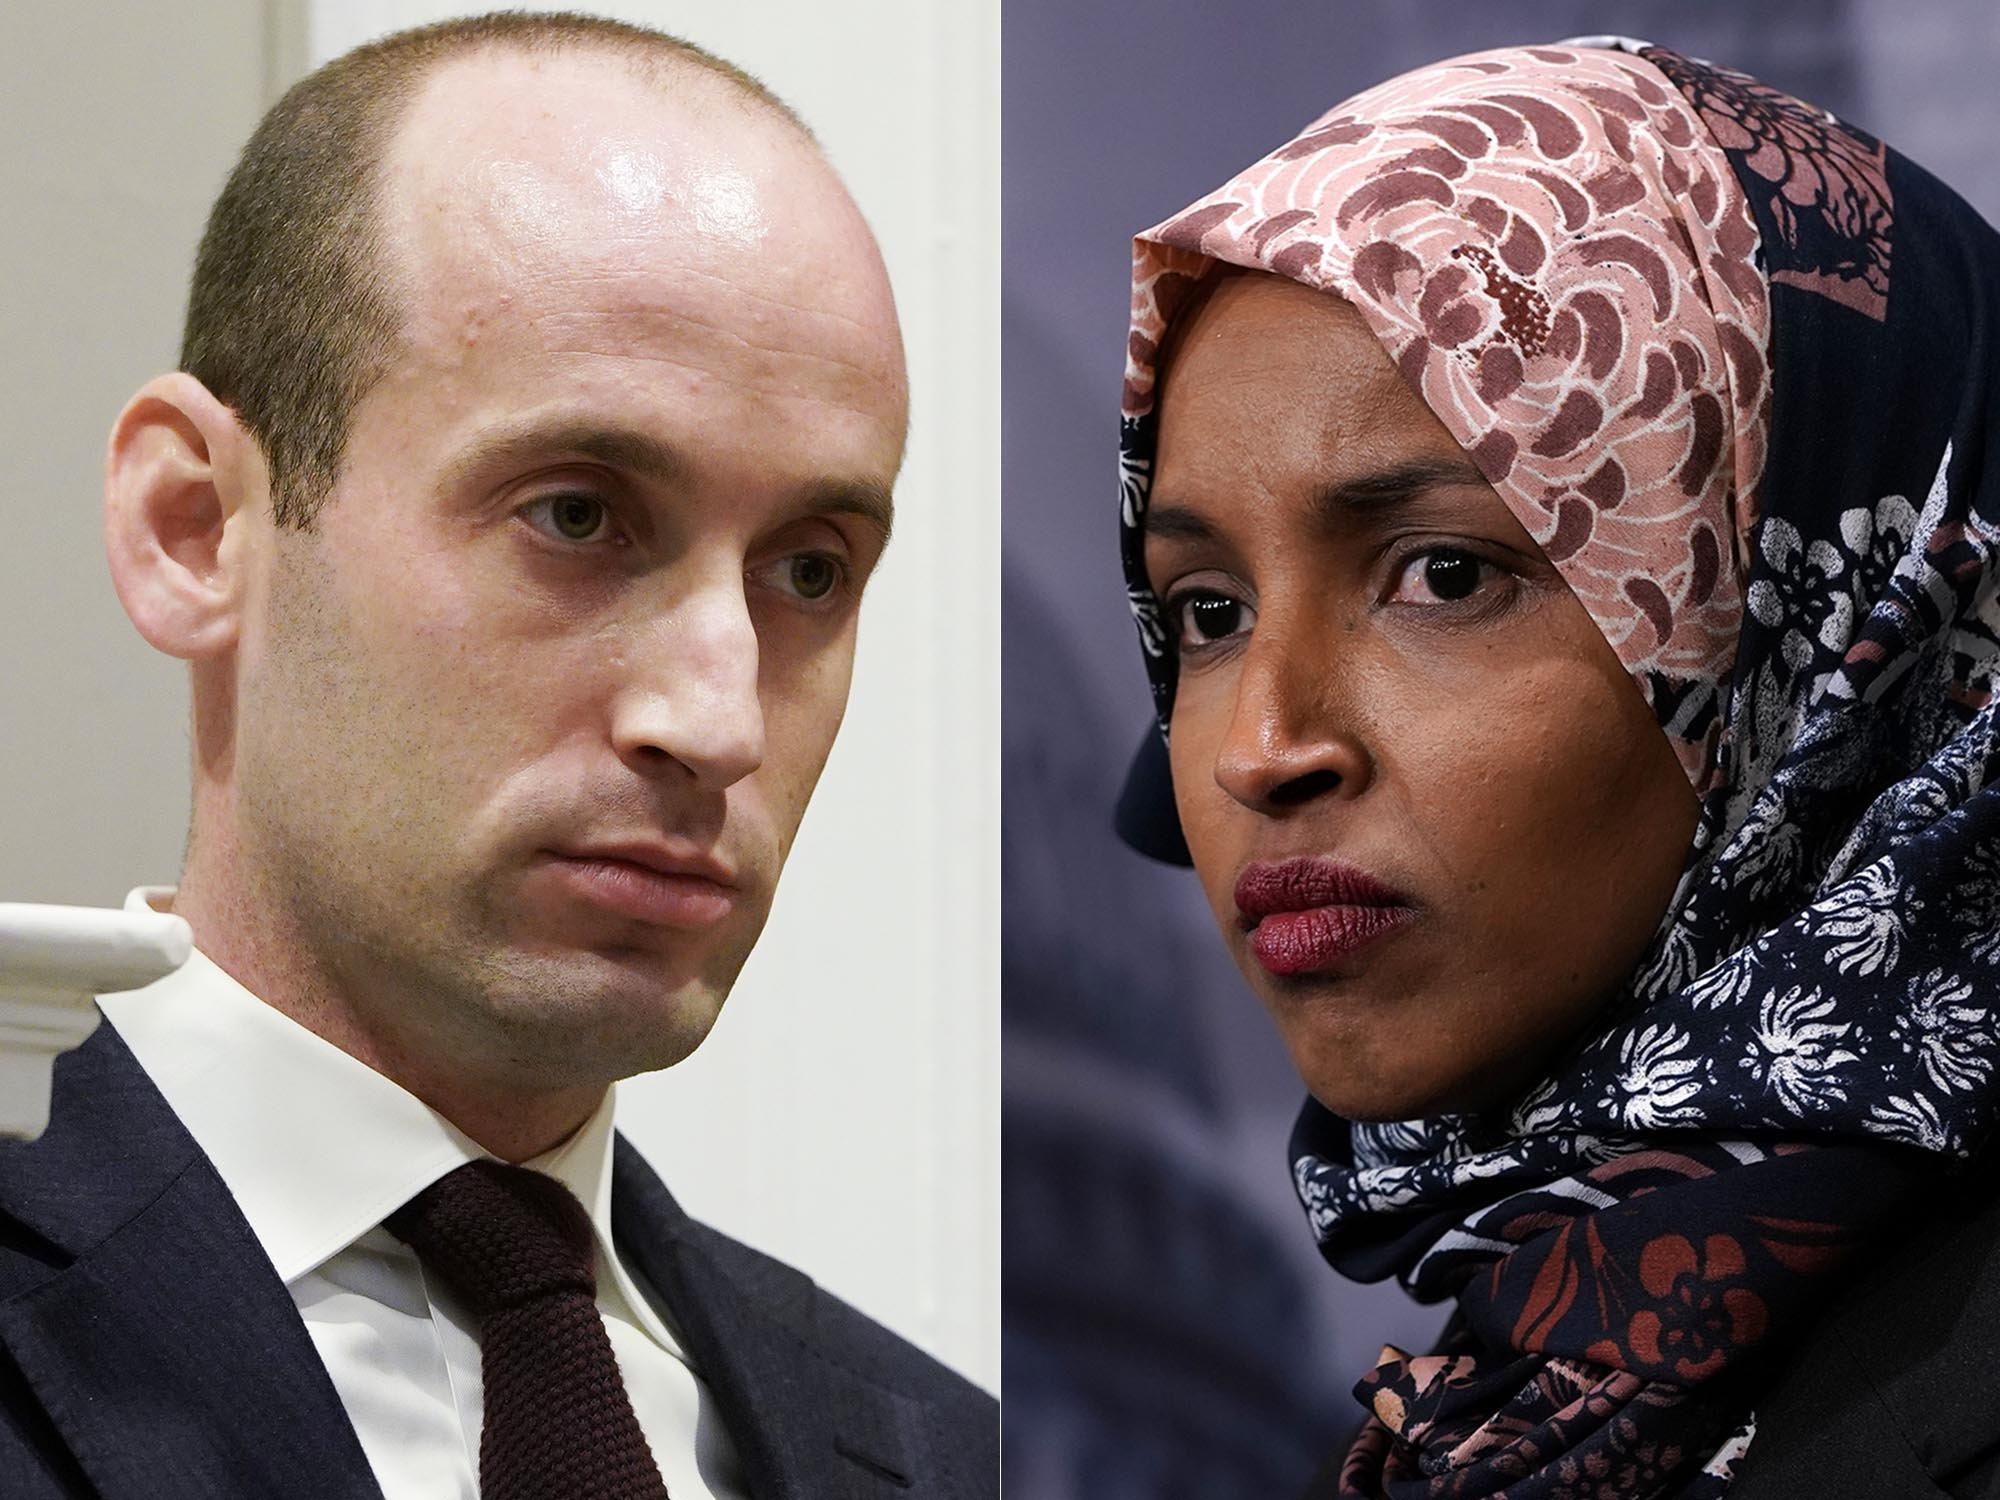 Rep. Ilhan Omar Calls Stephen Miller 'A White